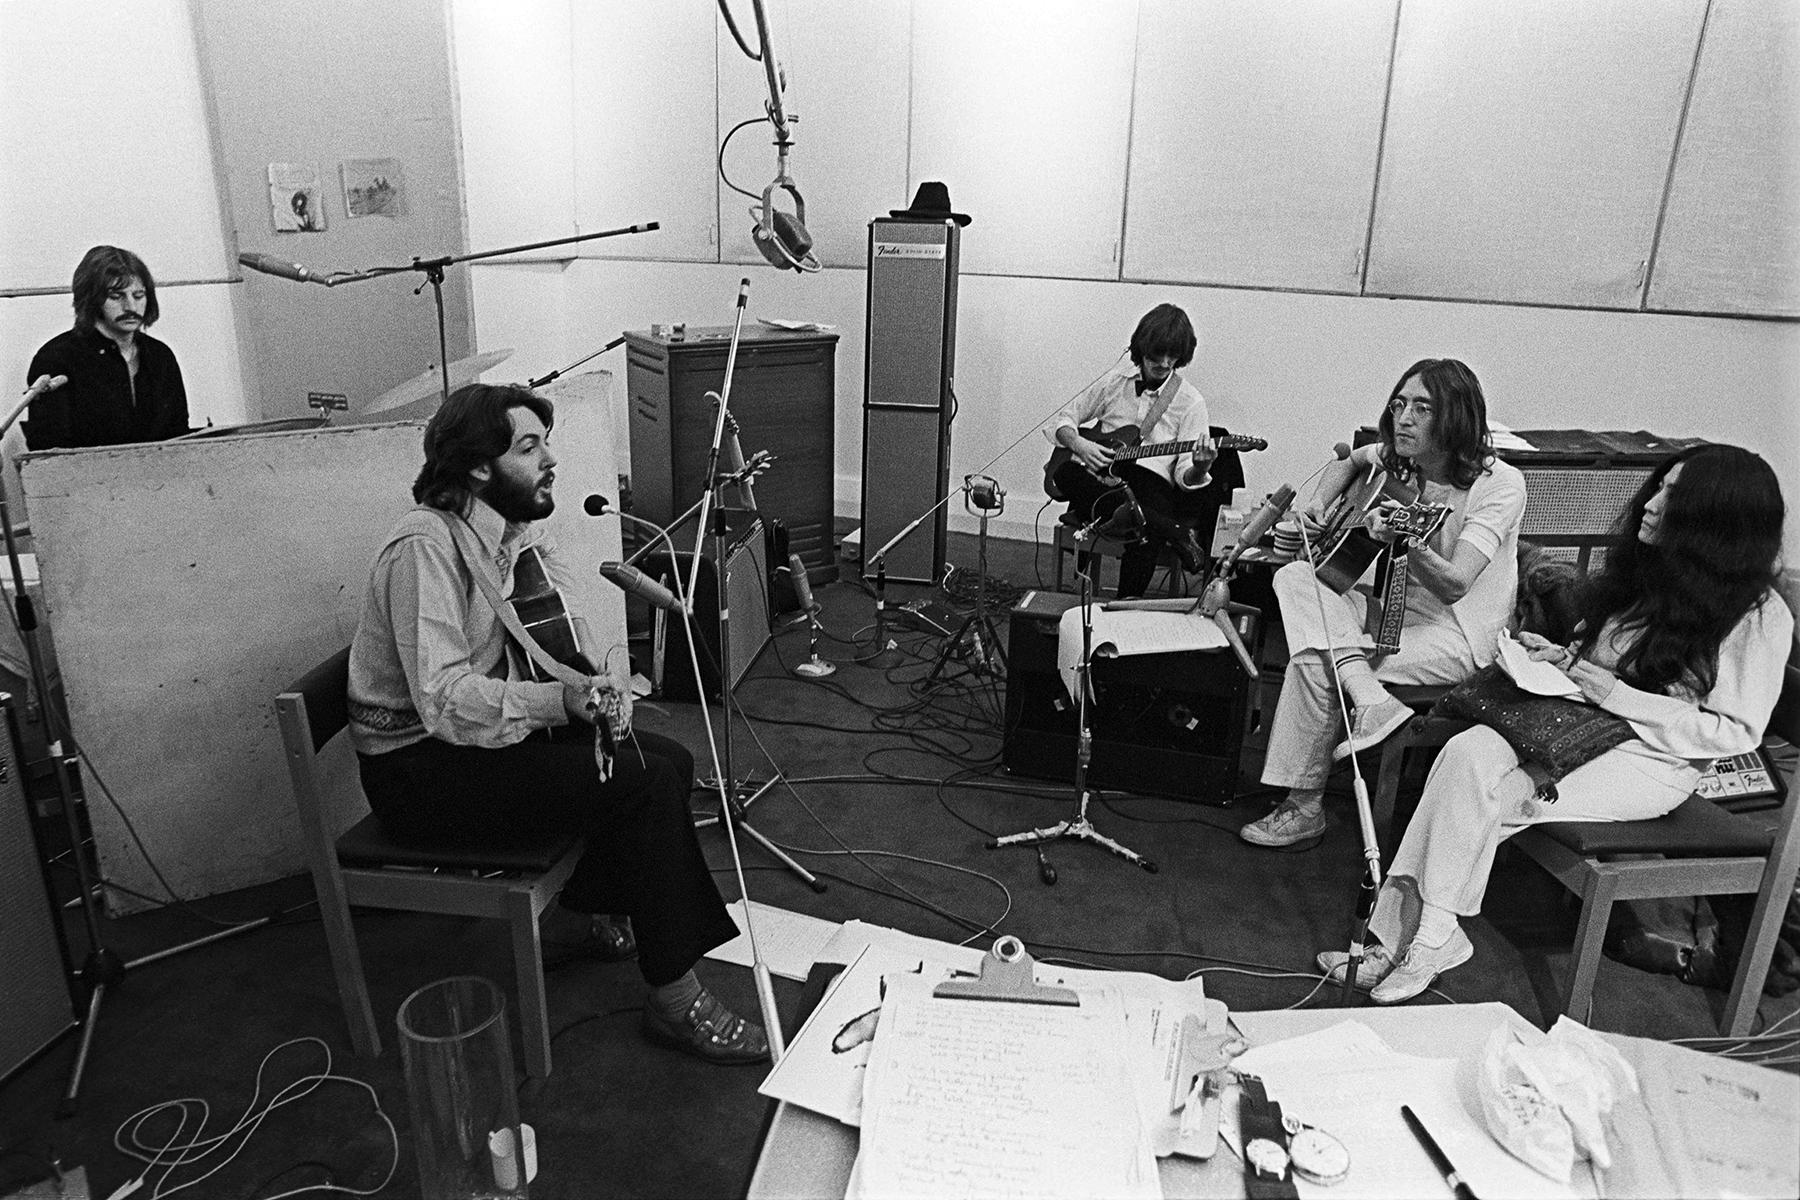 The Beatles at Apple Studios. 24 January 1969